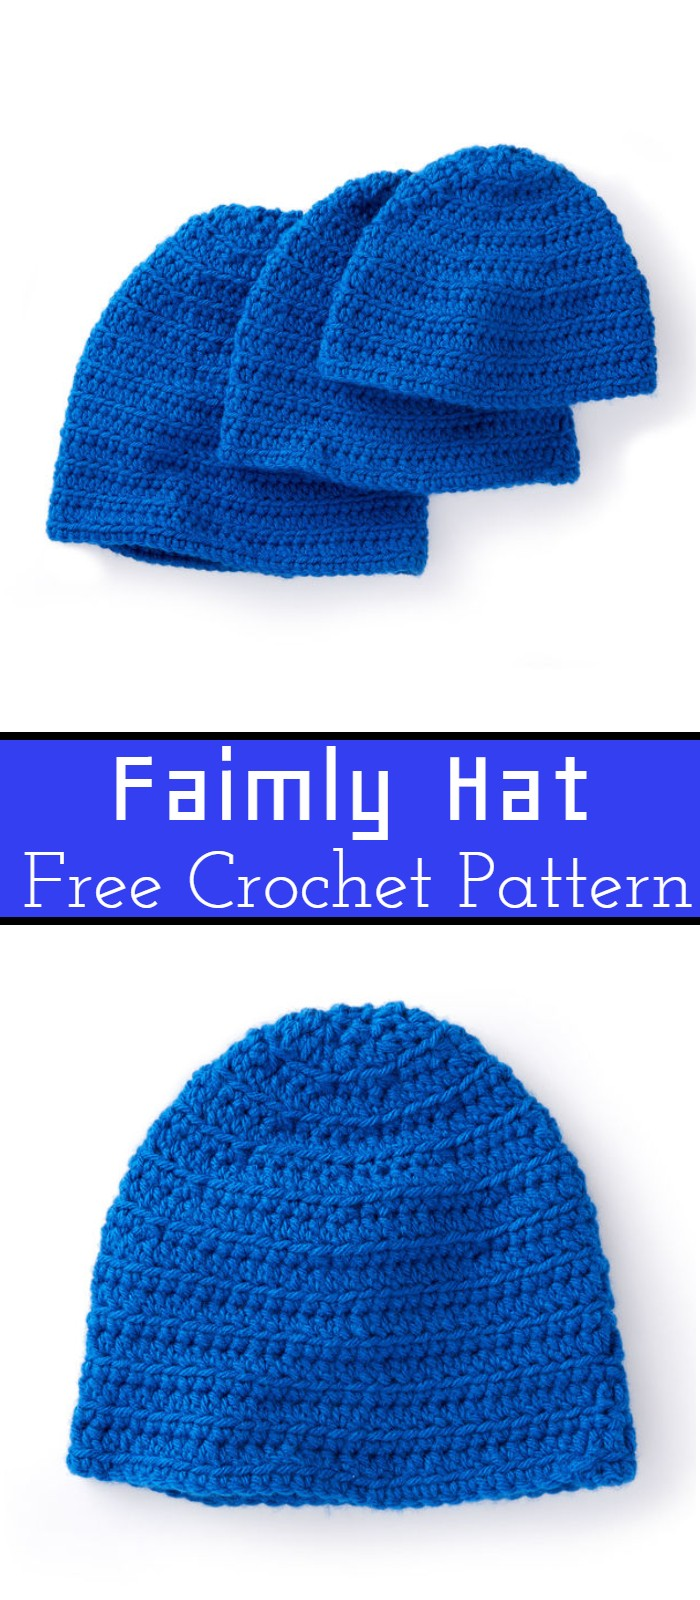 Family Crochet Hat Patterns